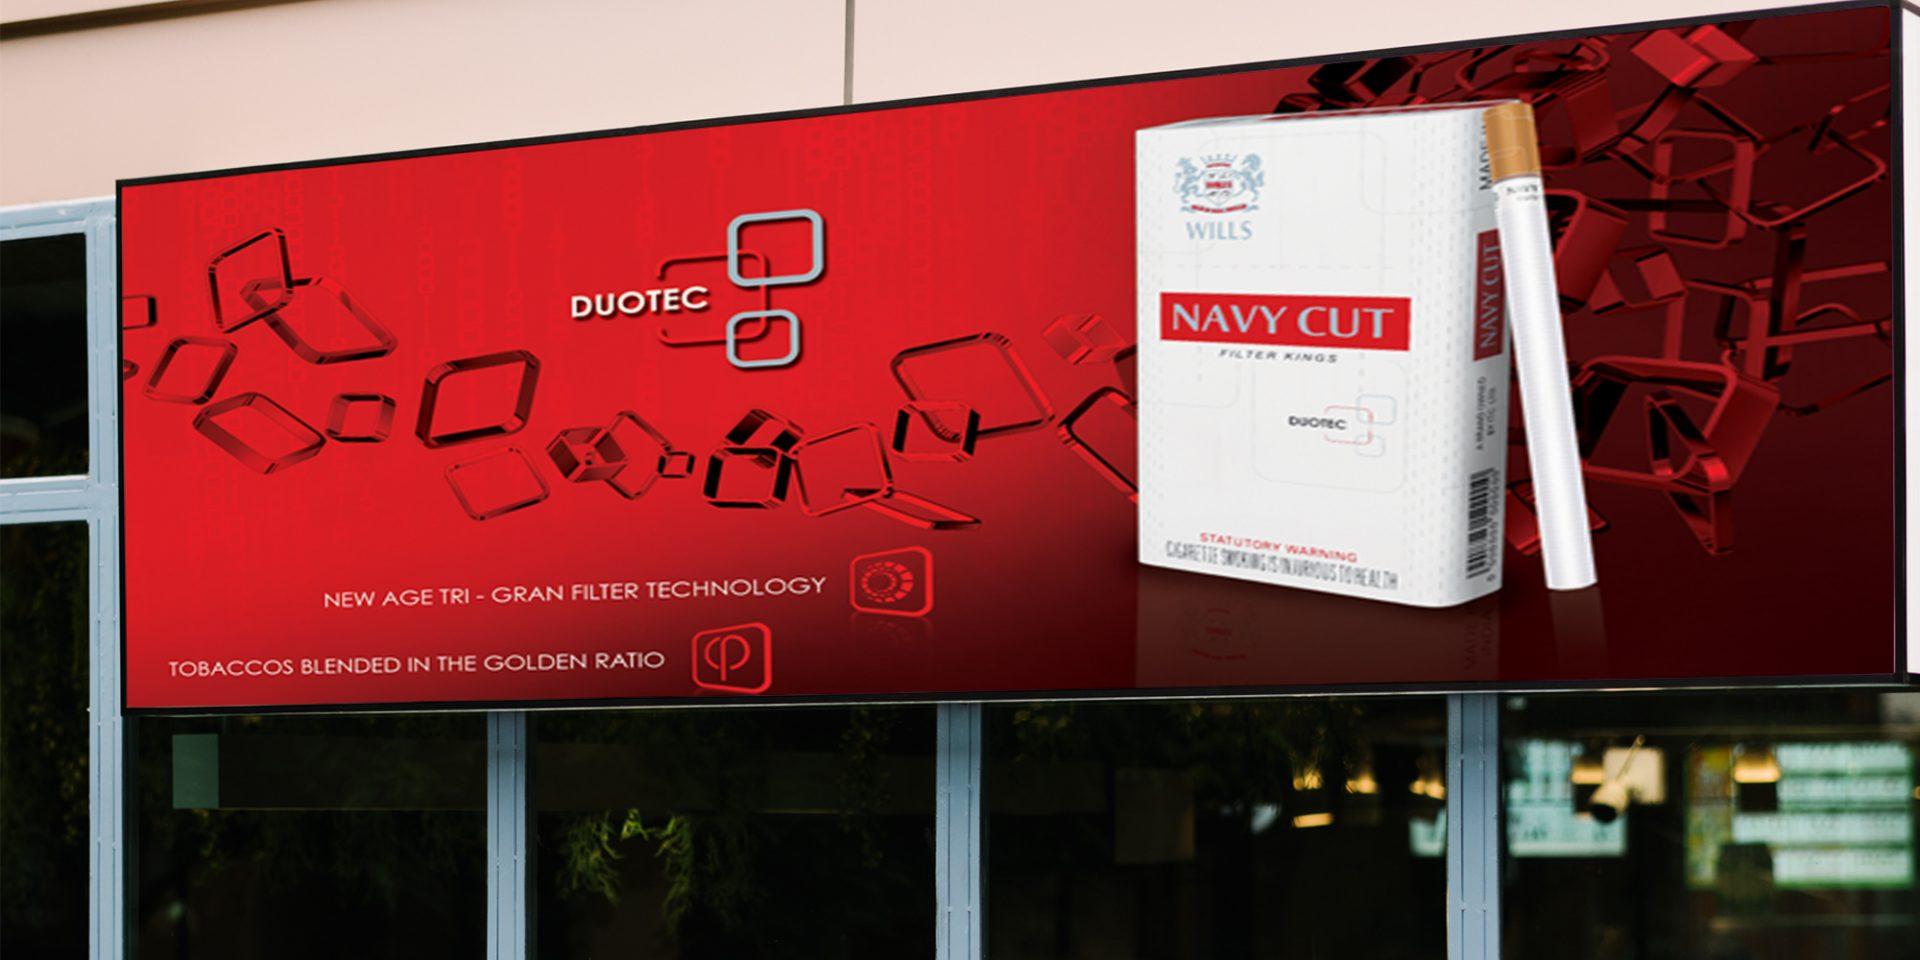 navycut cigerette shop facade - ITC Classic